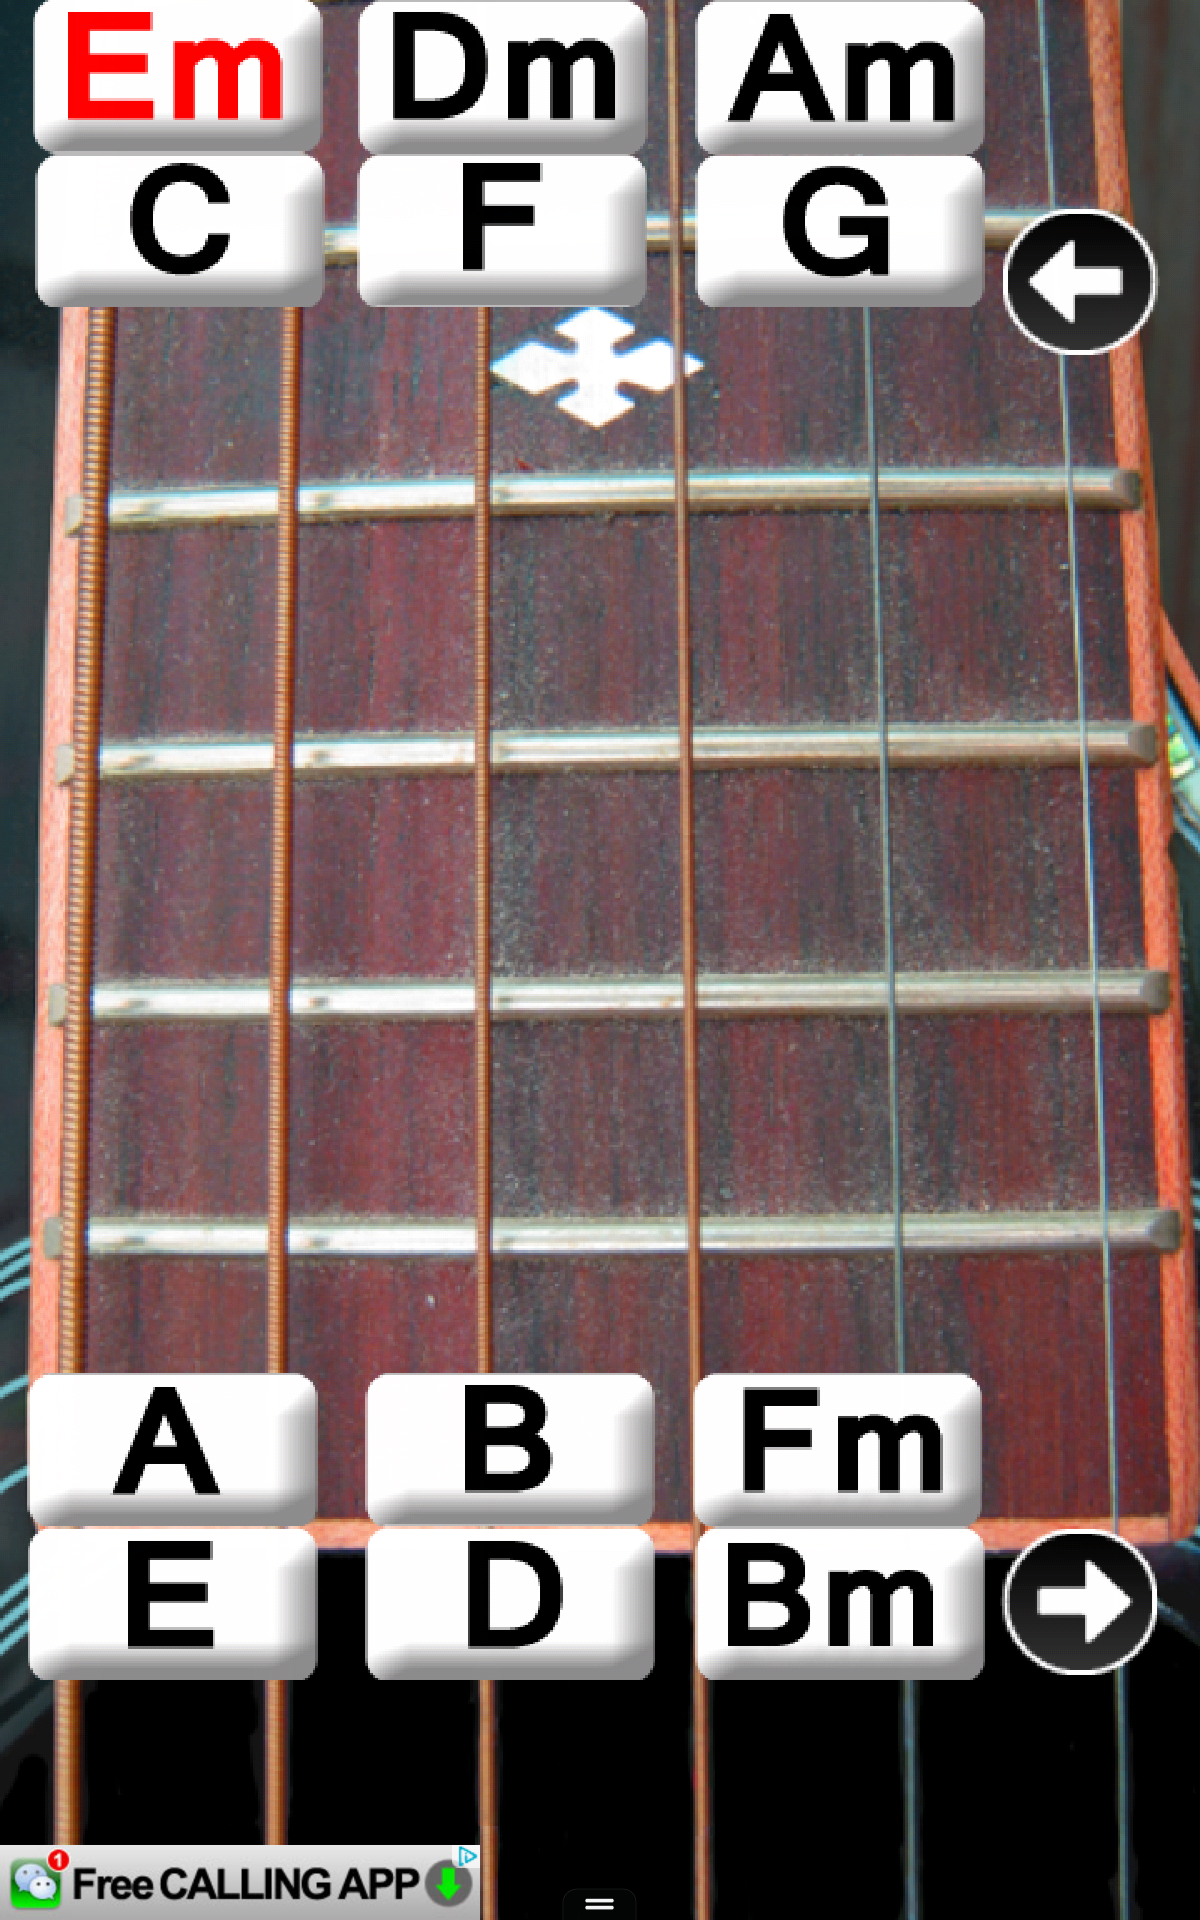 Virtual Acoustic Guitar: Amazon.es: Appstore para Android